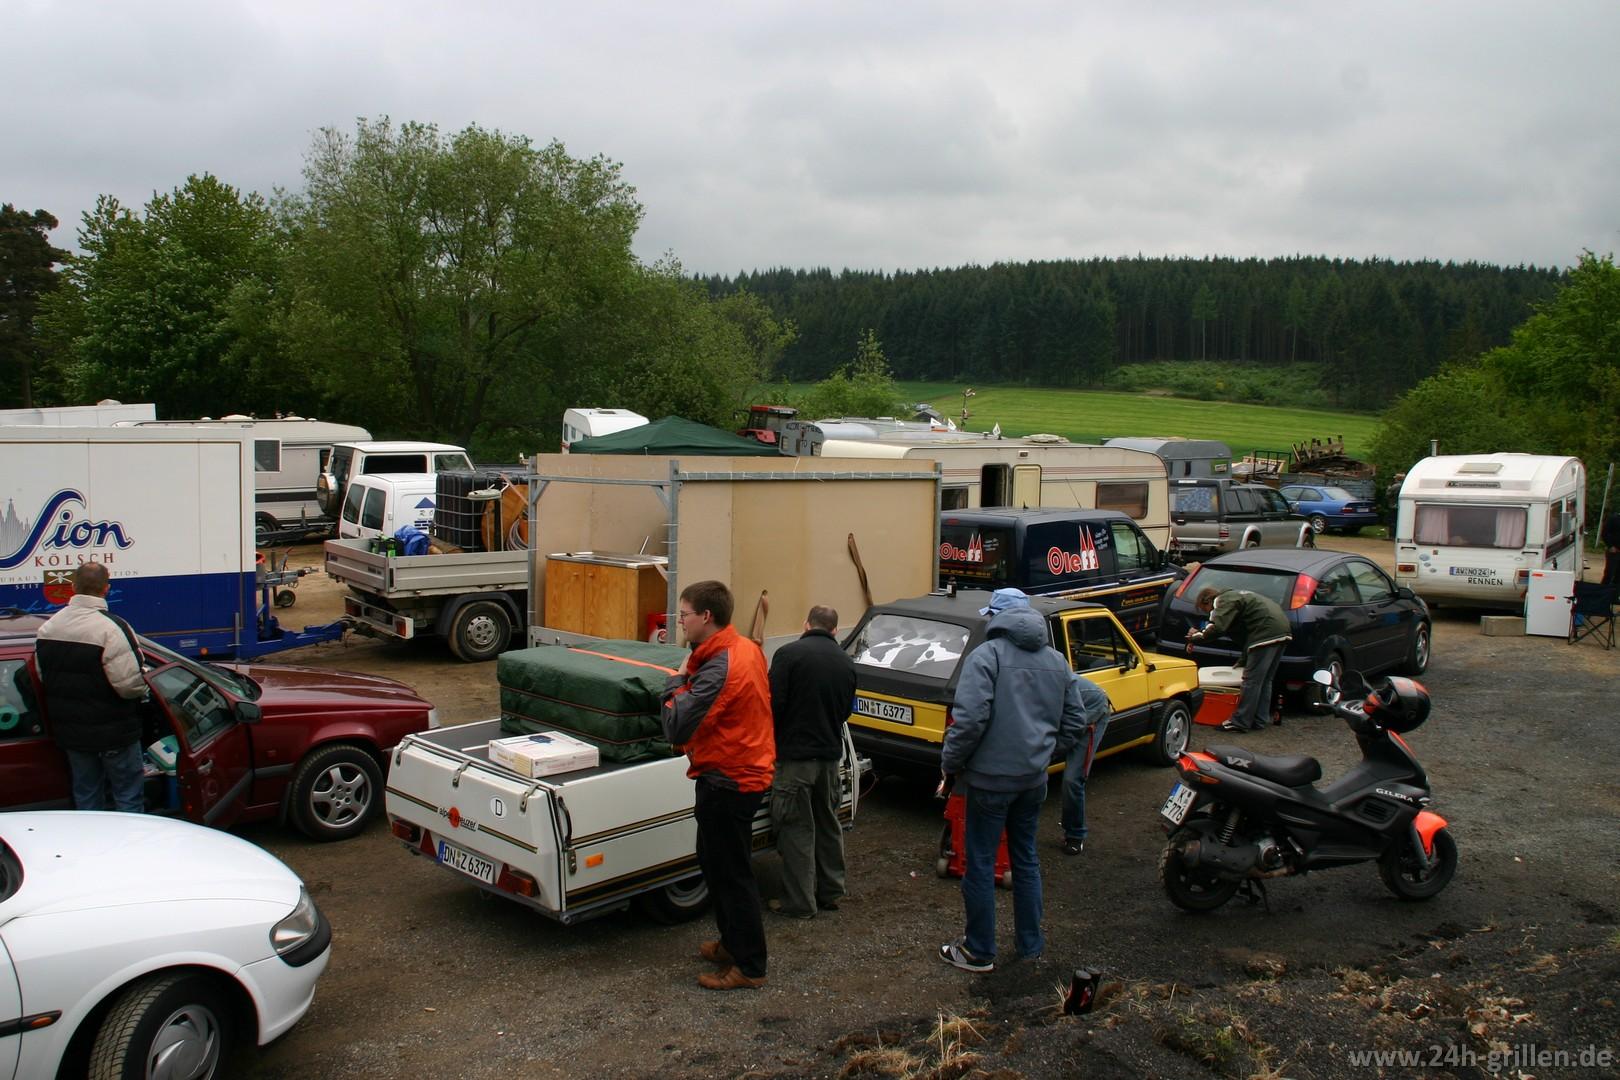 IMG_2008 (5)